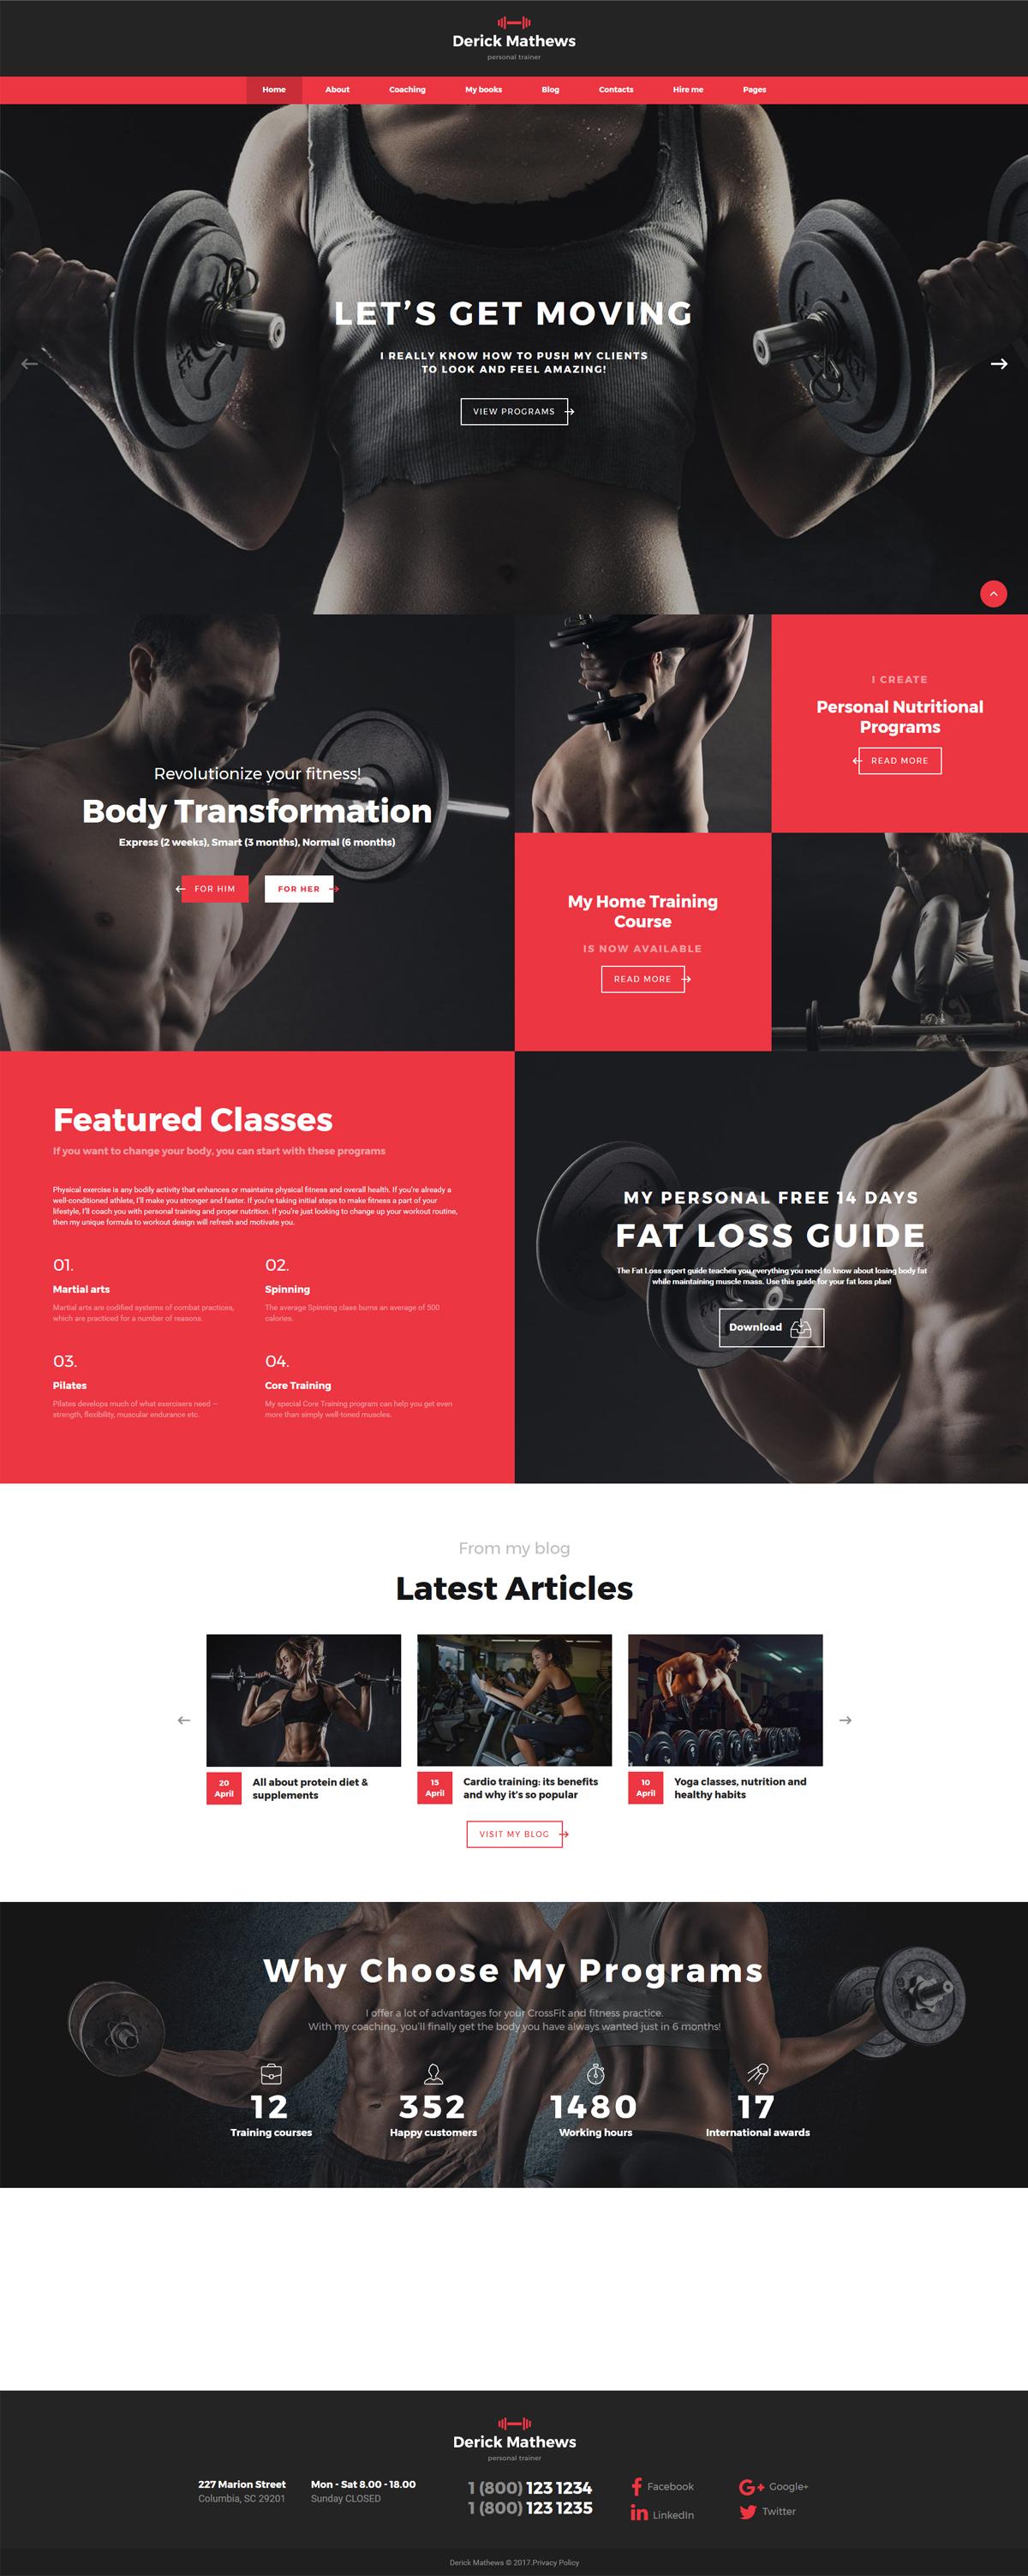 Reszponzív Derick Mathews - Personal Trainer Multipage Weboldal sablon 62181